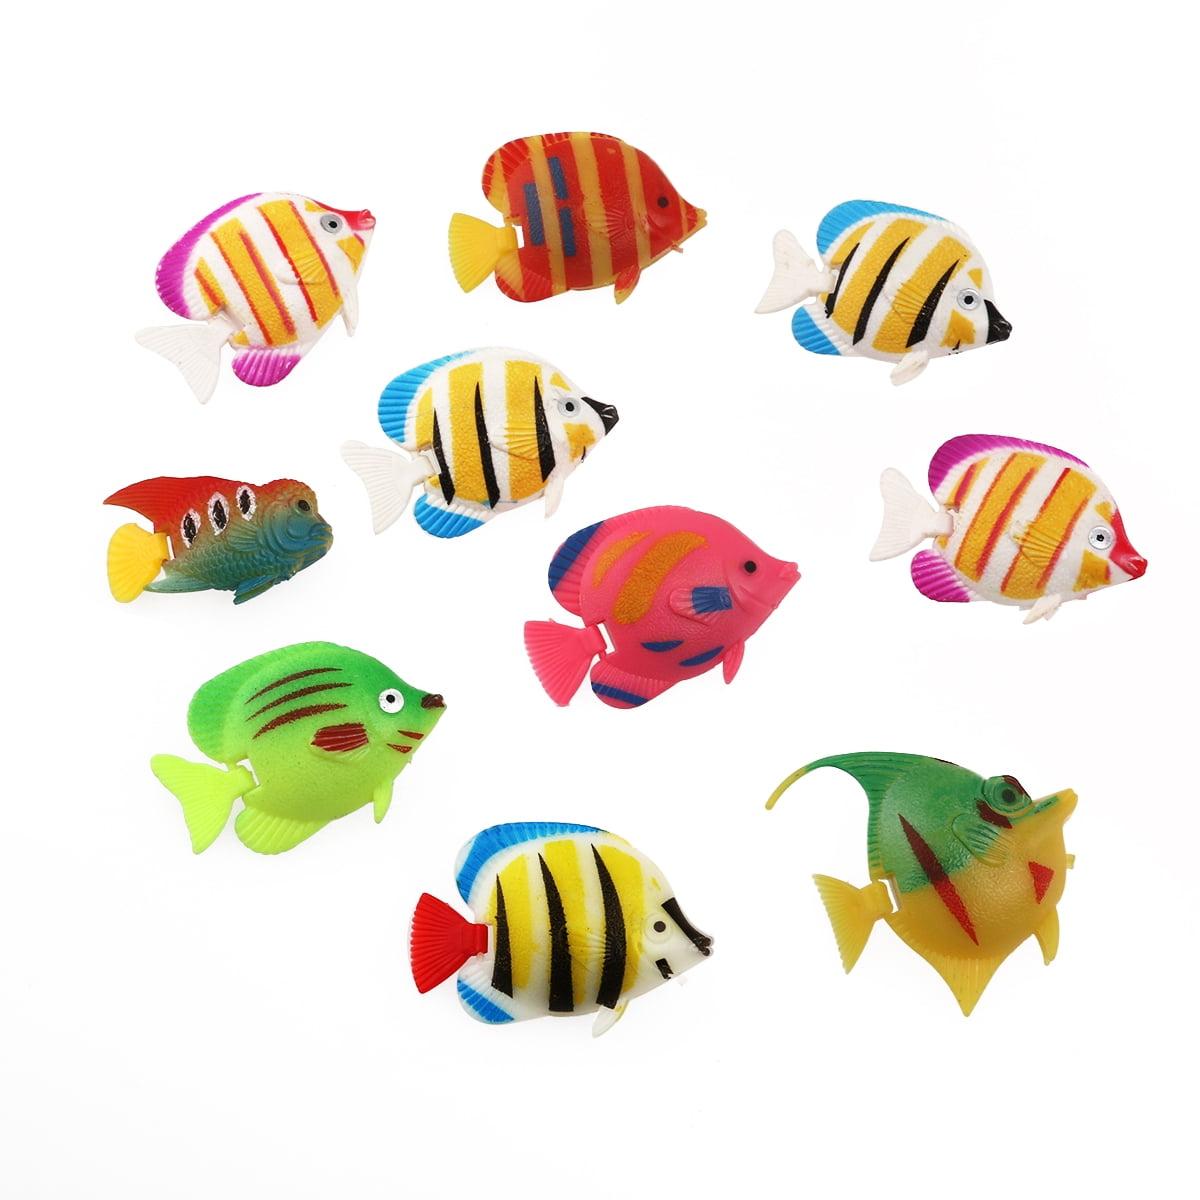 10pcs Lifelike Plastic Artificial Moving Floating Fishes Ornament Decorations for Aquarium Fish Tank (Random Color & Pattern)